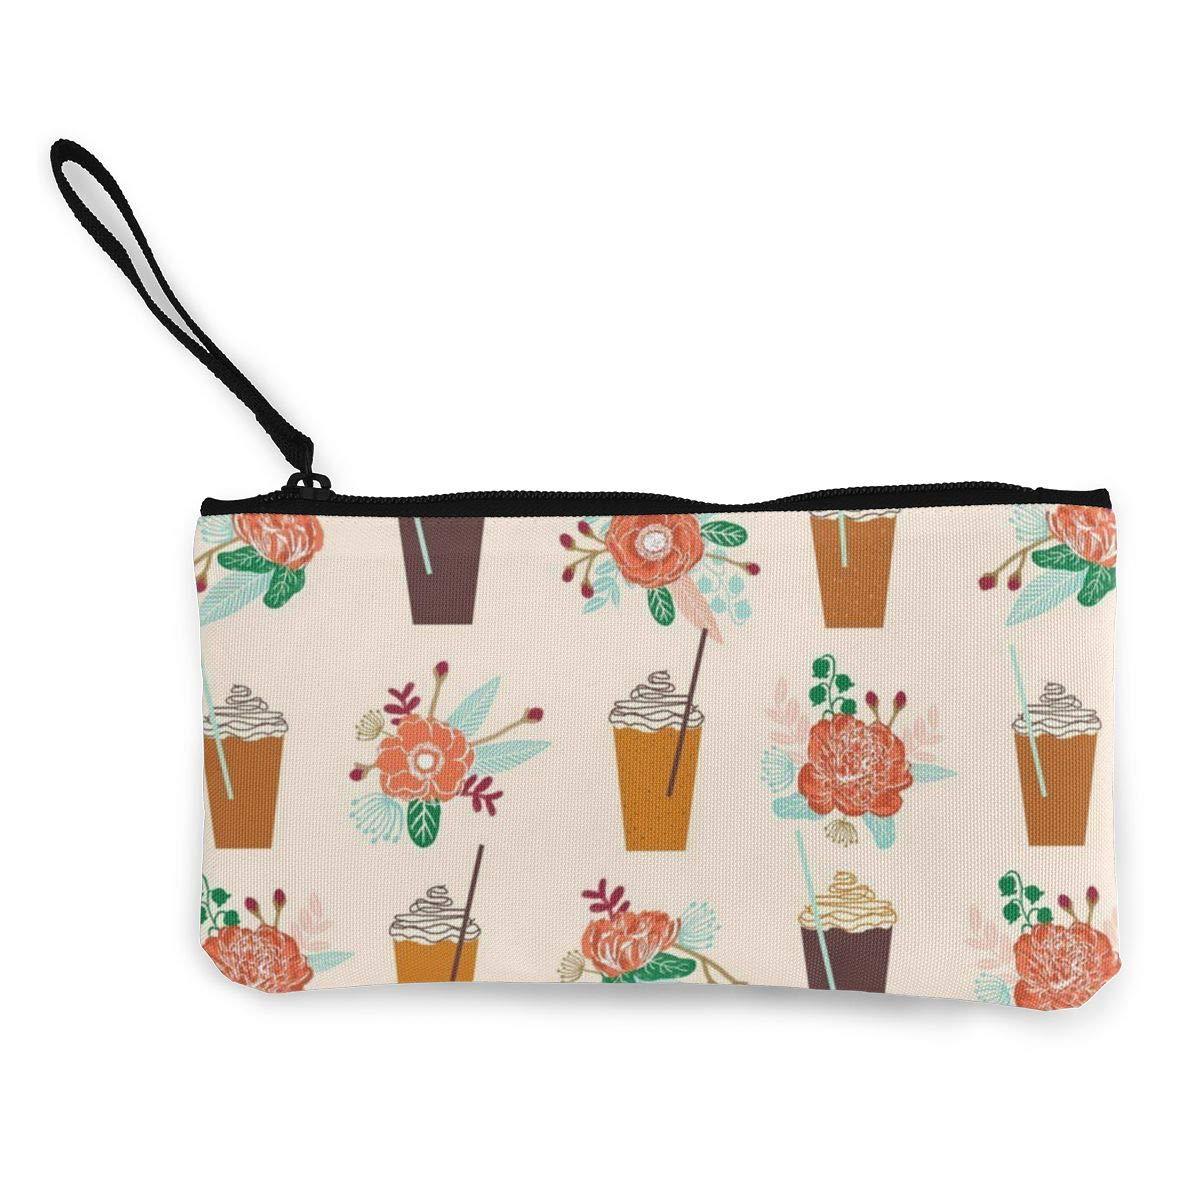 Coin Pouch Pumpkin Autumn Flower Girly Canvas Coin Purse Cellphone Card Bag With Handle And Zipper